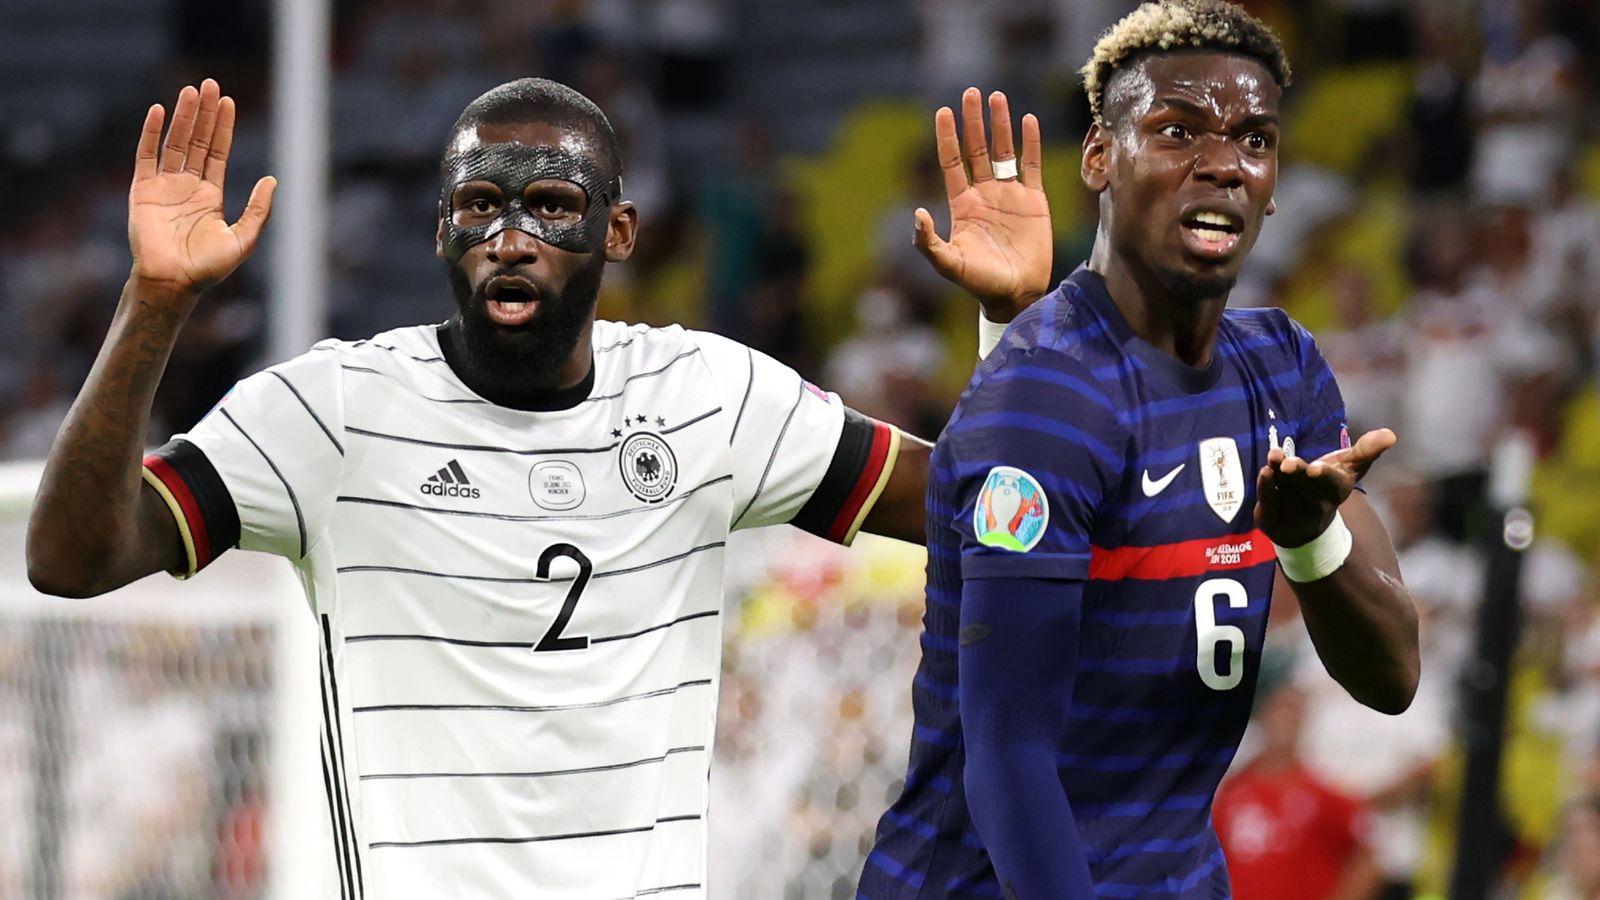 Antonio Rudiger escapes punishment over Paul Pogba 'bite' as Uefa decide against disciplinary case - Bóng Đá